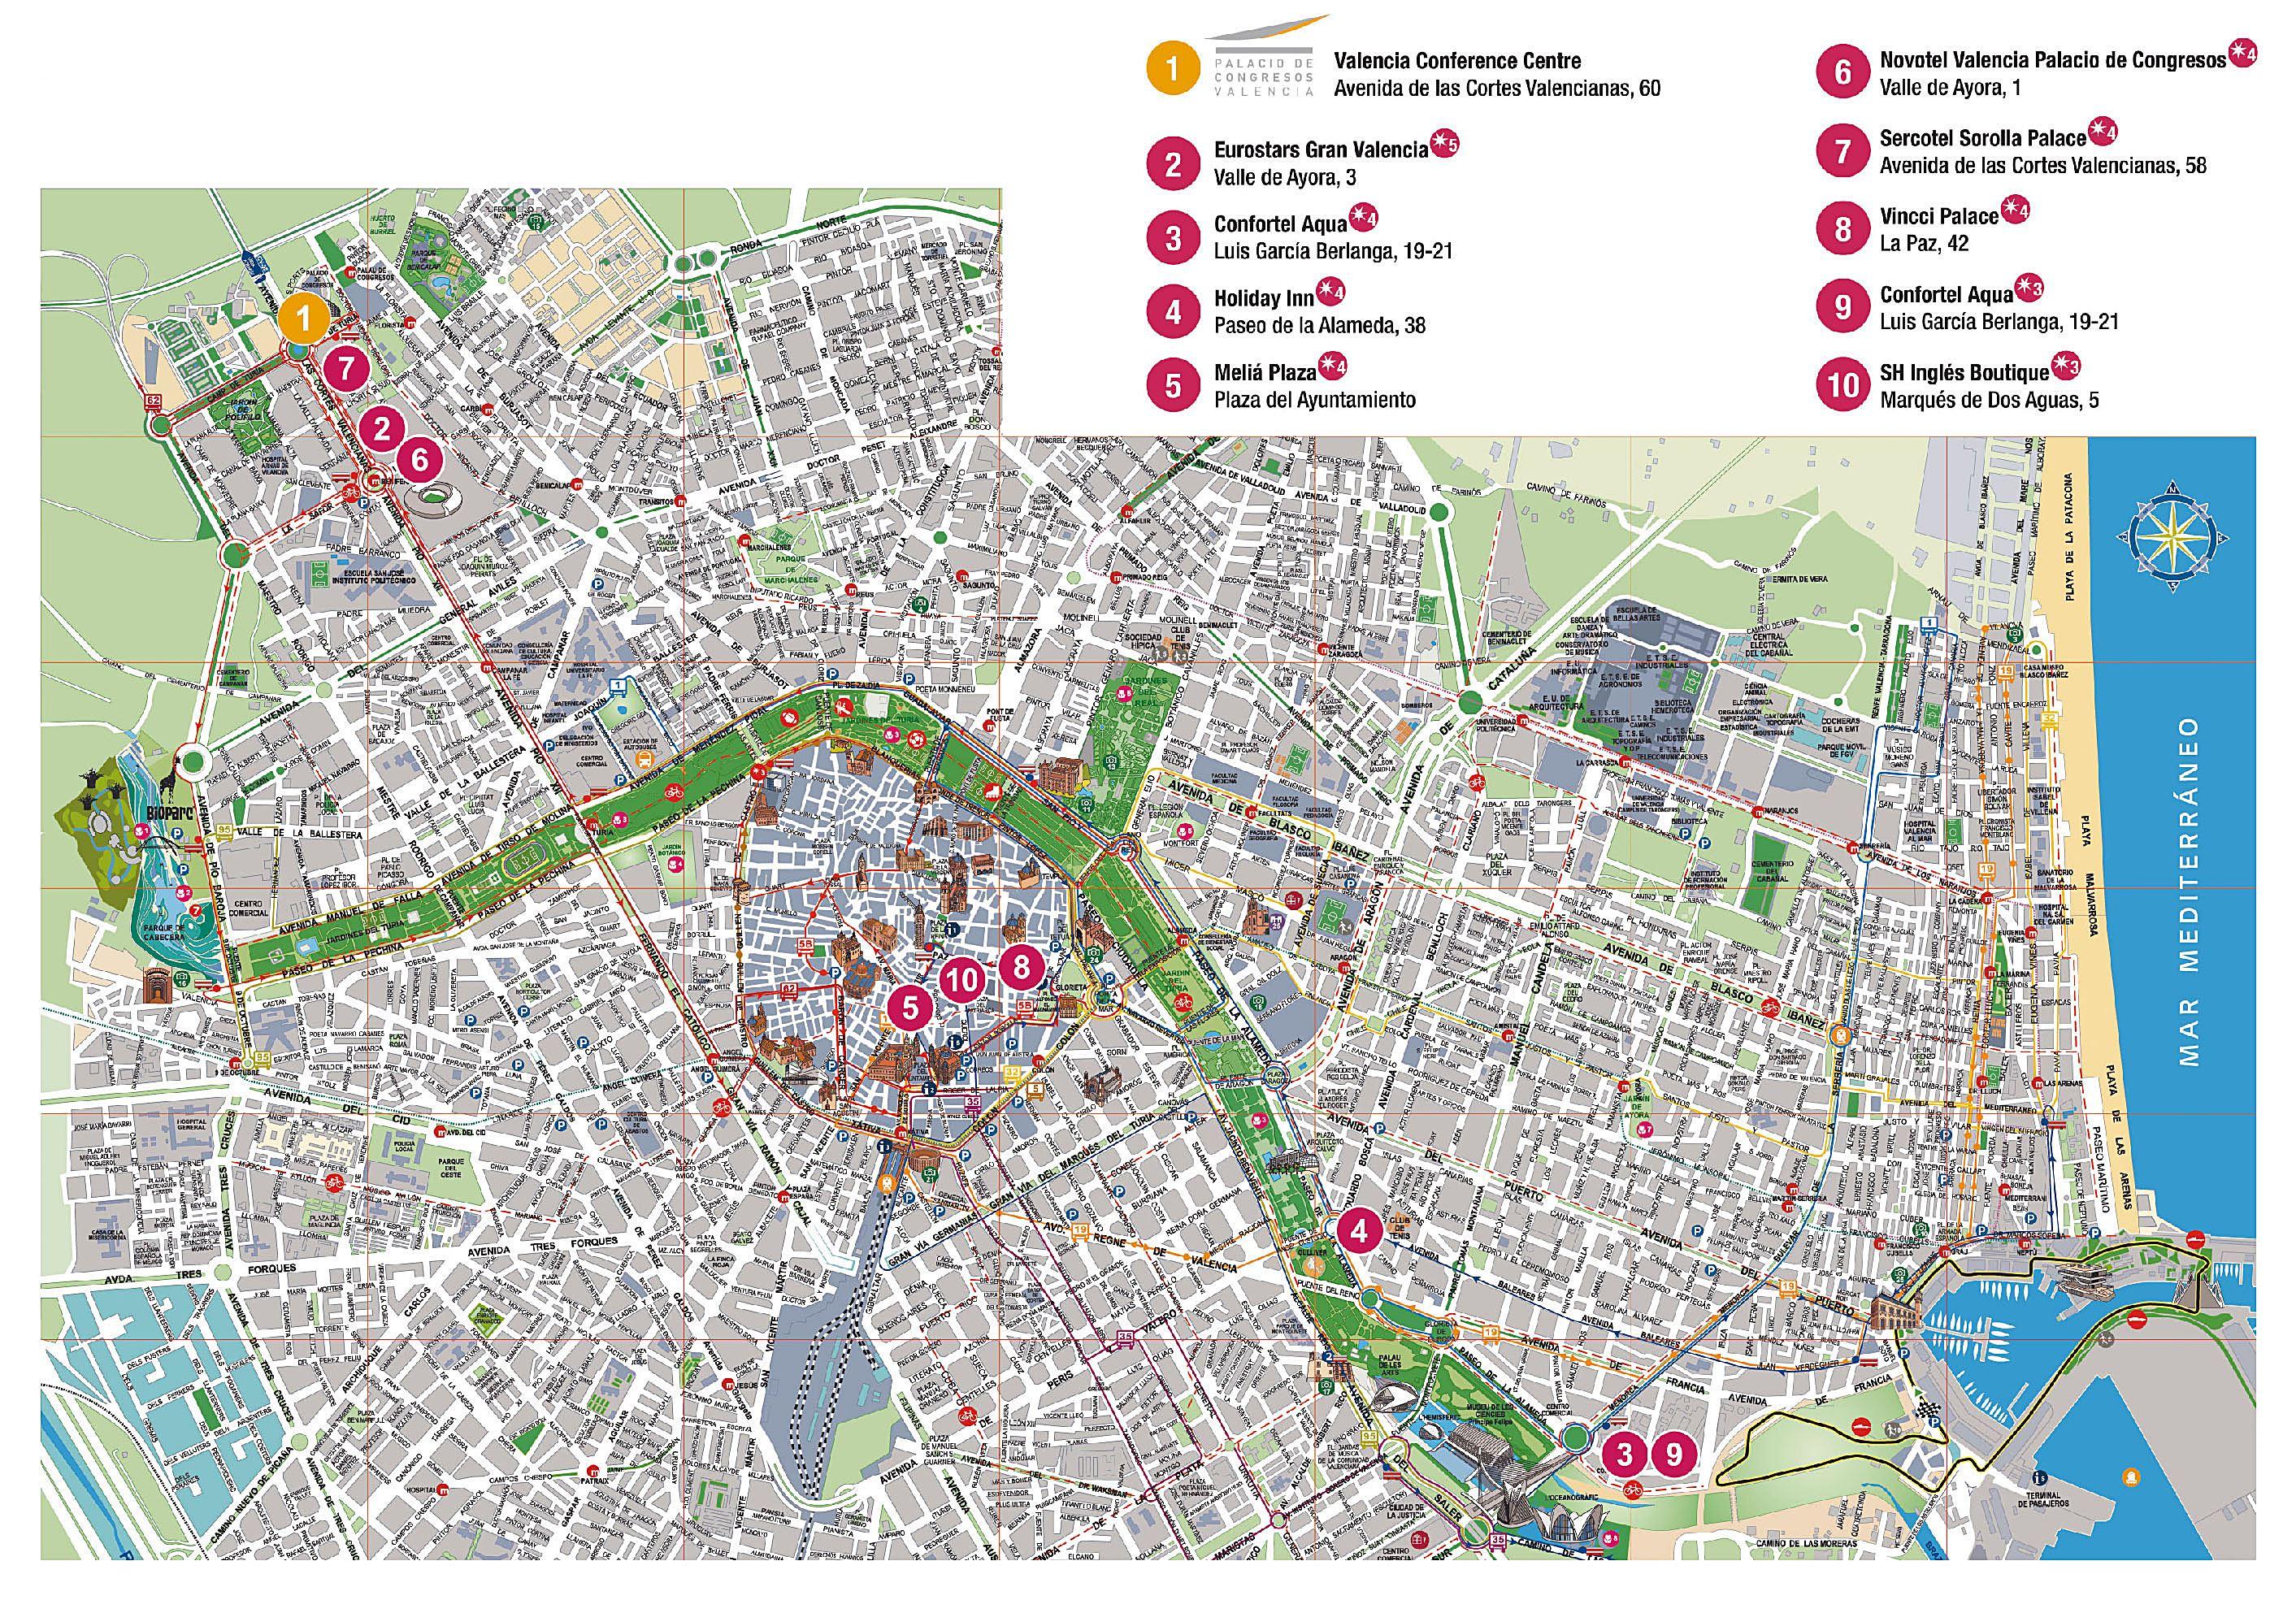 valência mapa Large Valencia Maps for Free Download and Print | High Resolution  valência mapa